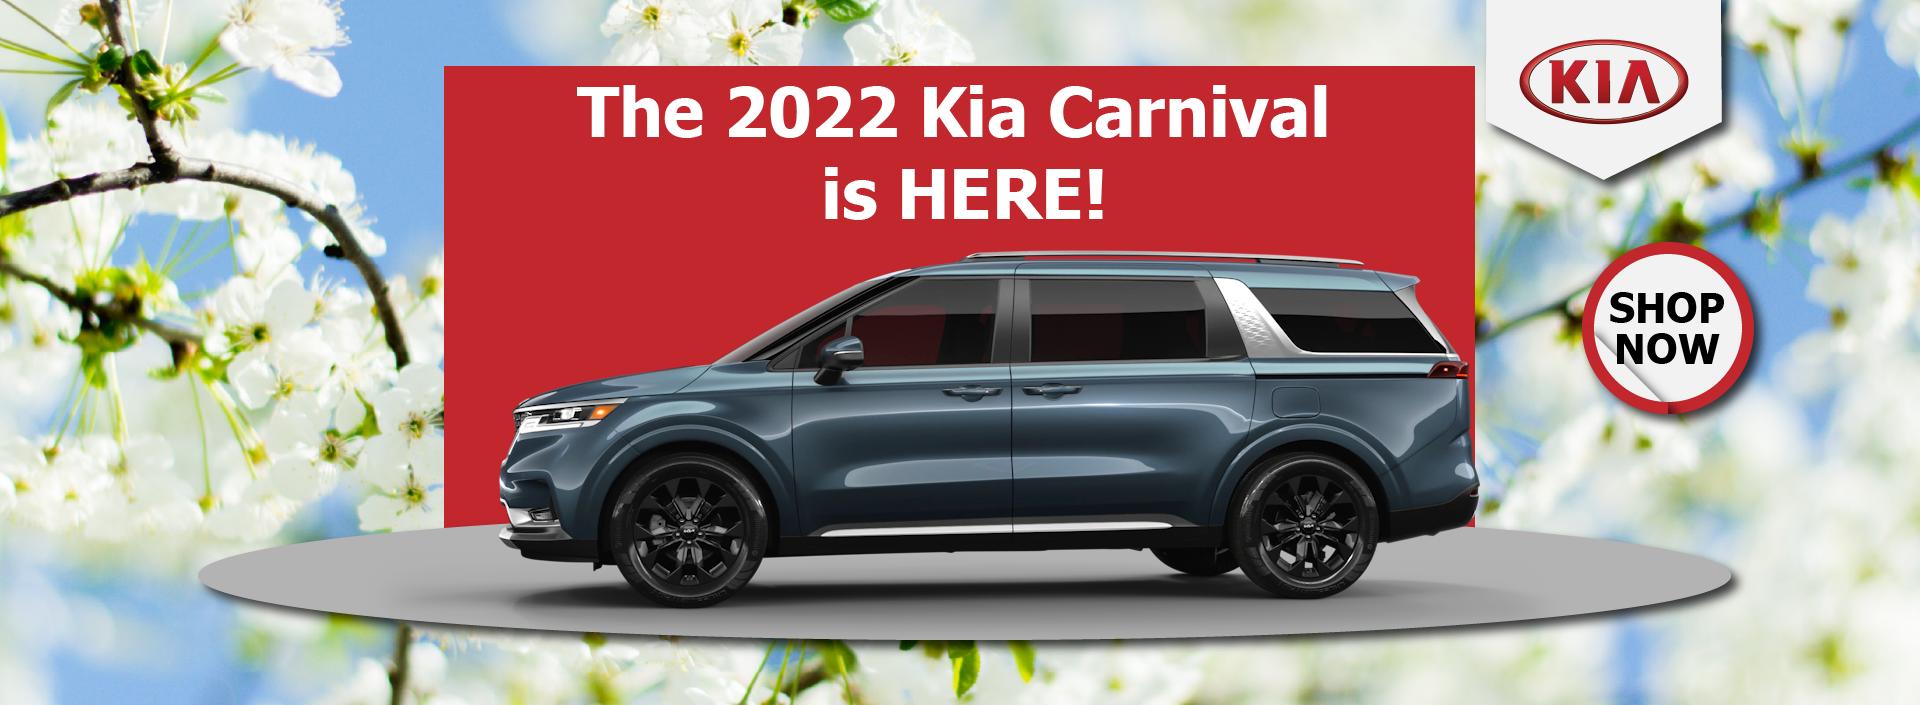 2022 Kia Carnival April FIXED